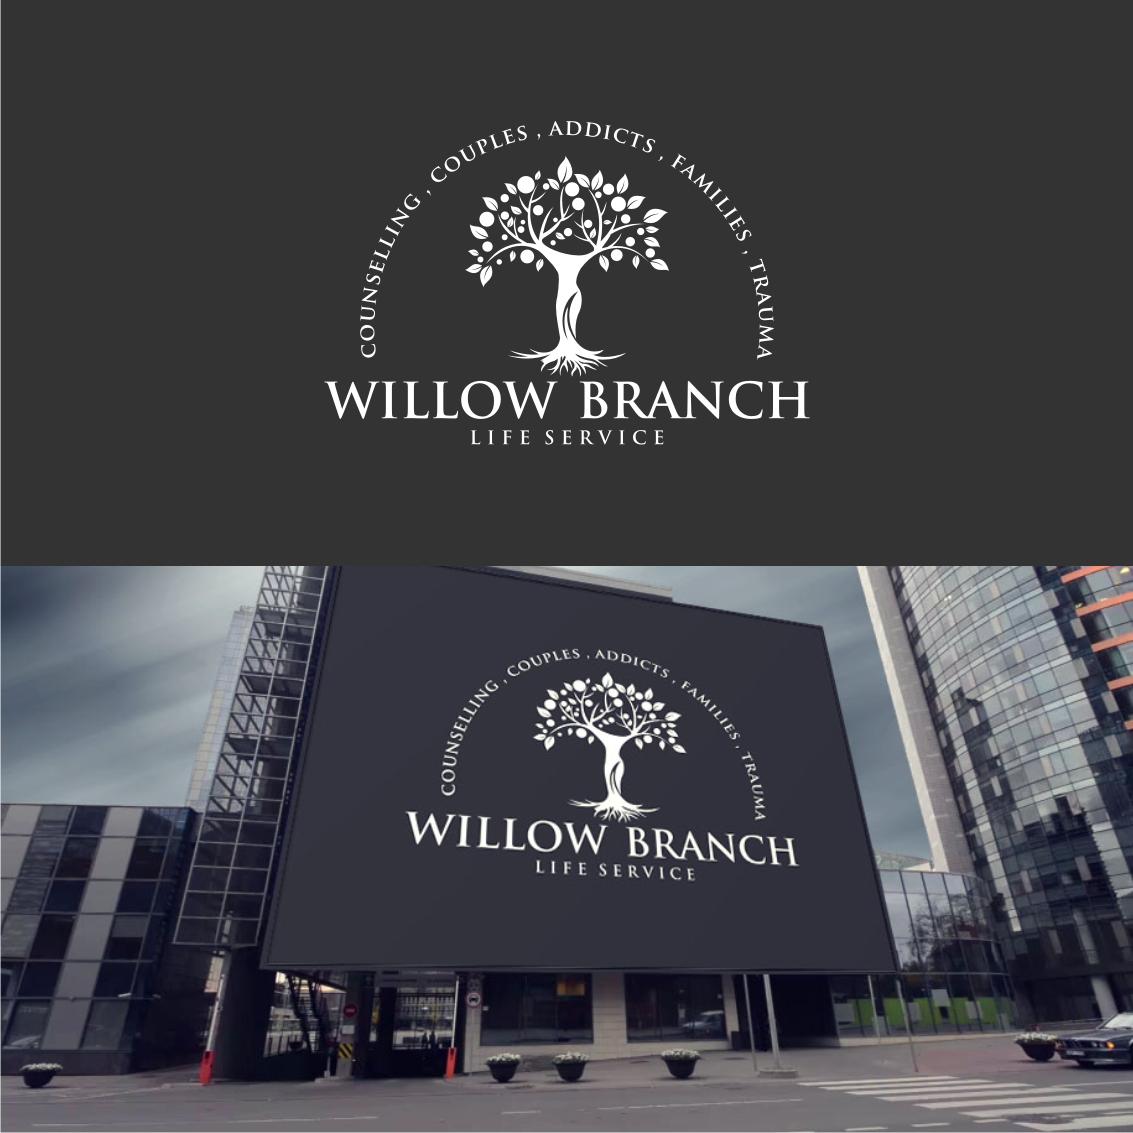 Logo Design by Analla Art - Entry No. 92 in the Logo Design Contest Artistic Logo Design for Willow Branch Life Service.